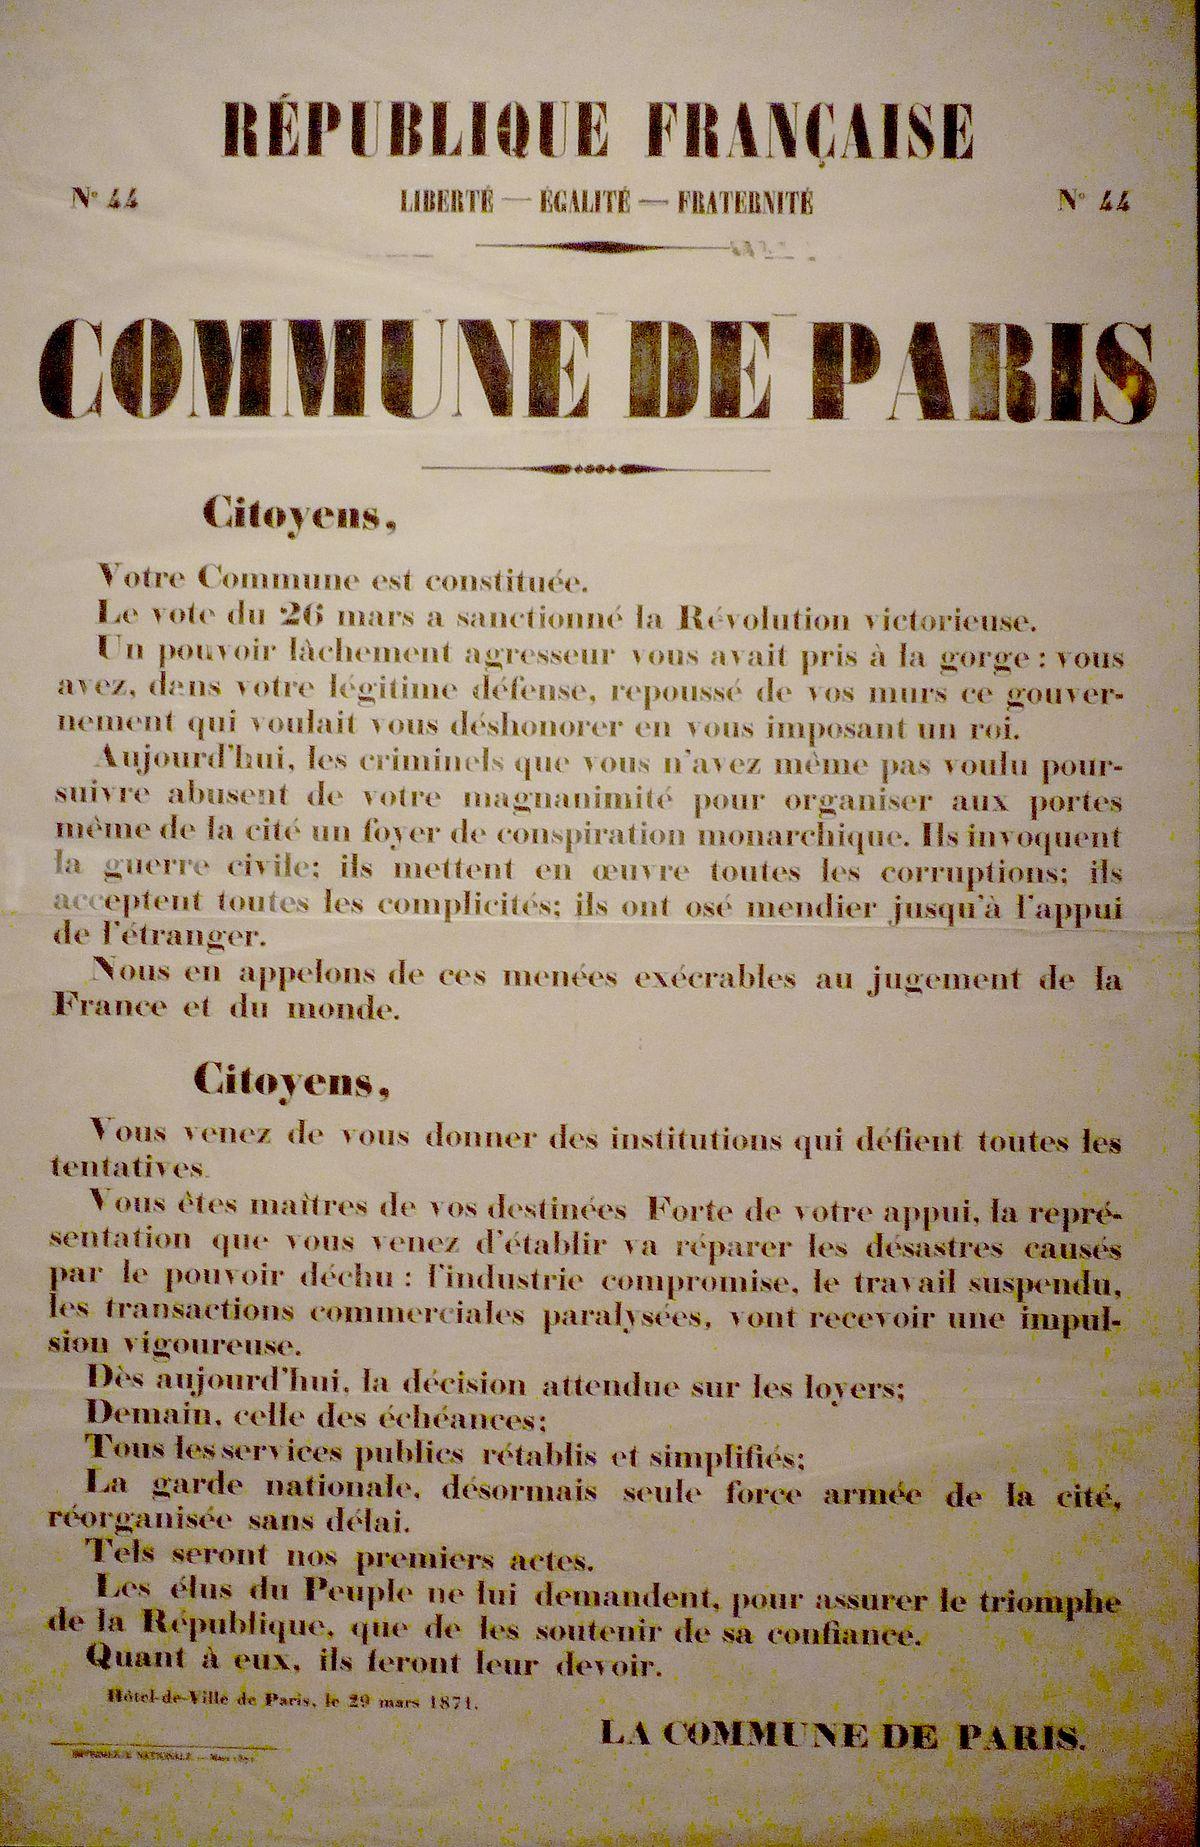 La Commune De Paris Documentaire : commune, paris, documentaire, Commune, (Paris,, 1871), Wikipédia